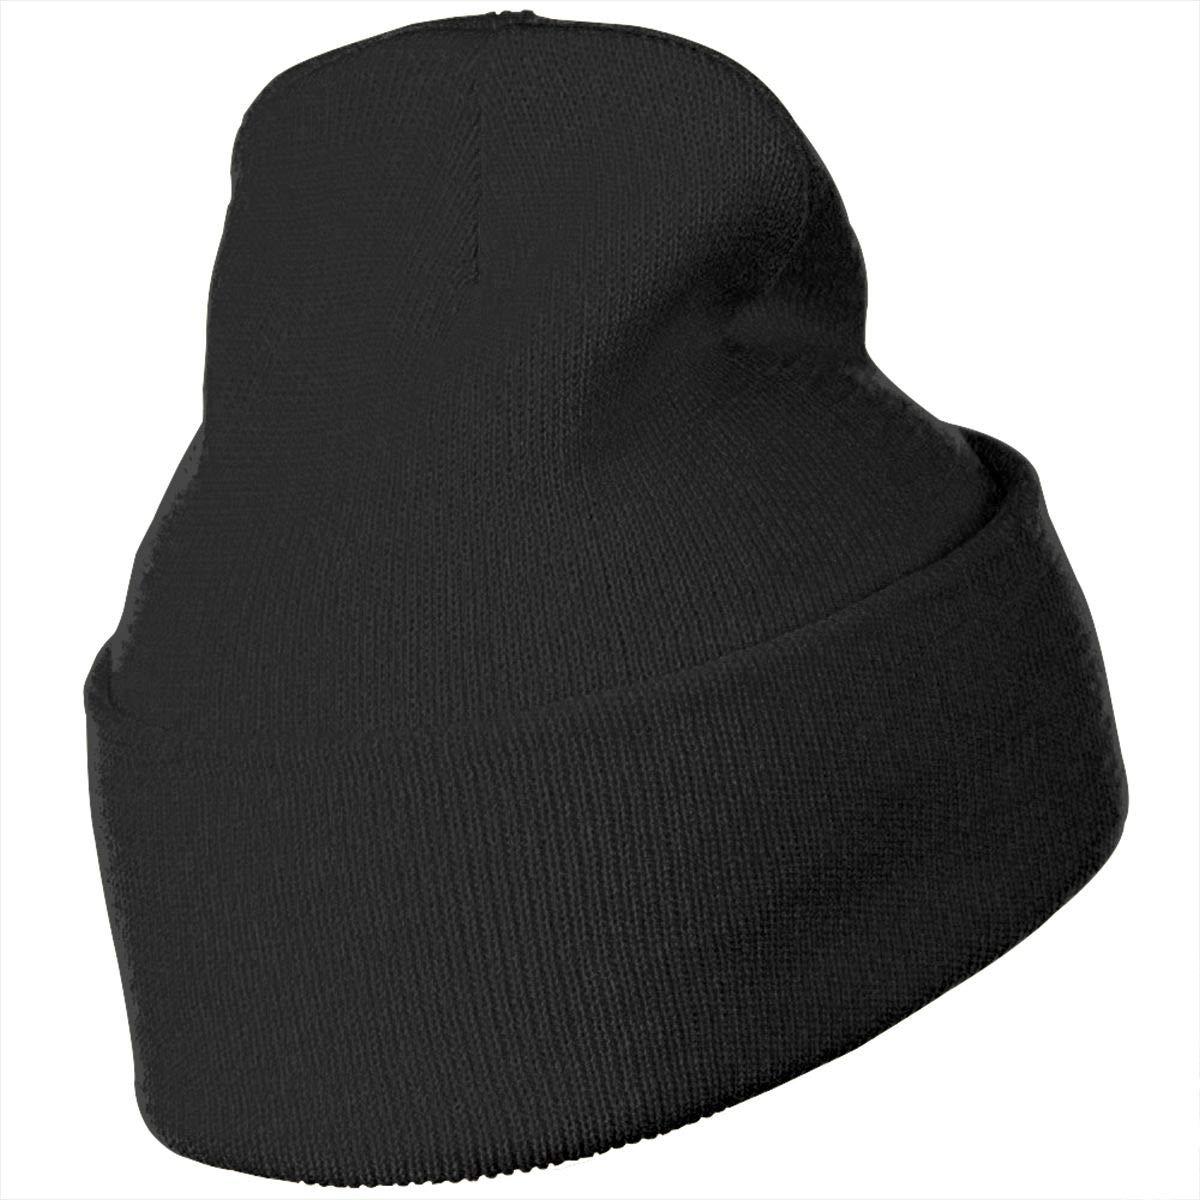 Birds Skull Cap Men Women Knit Hats Stretchy /& Soft Beanie